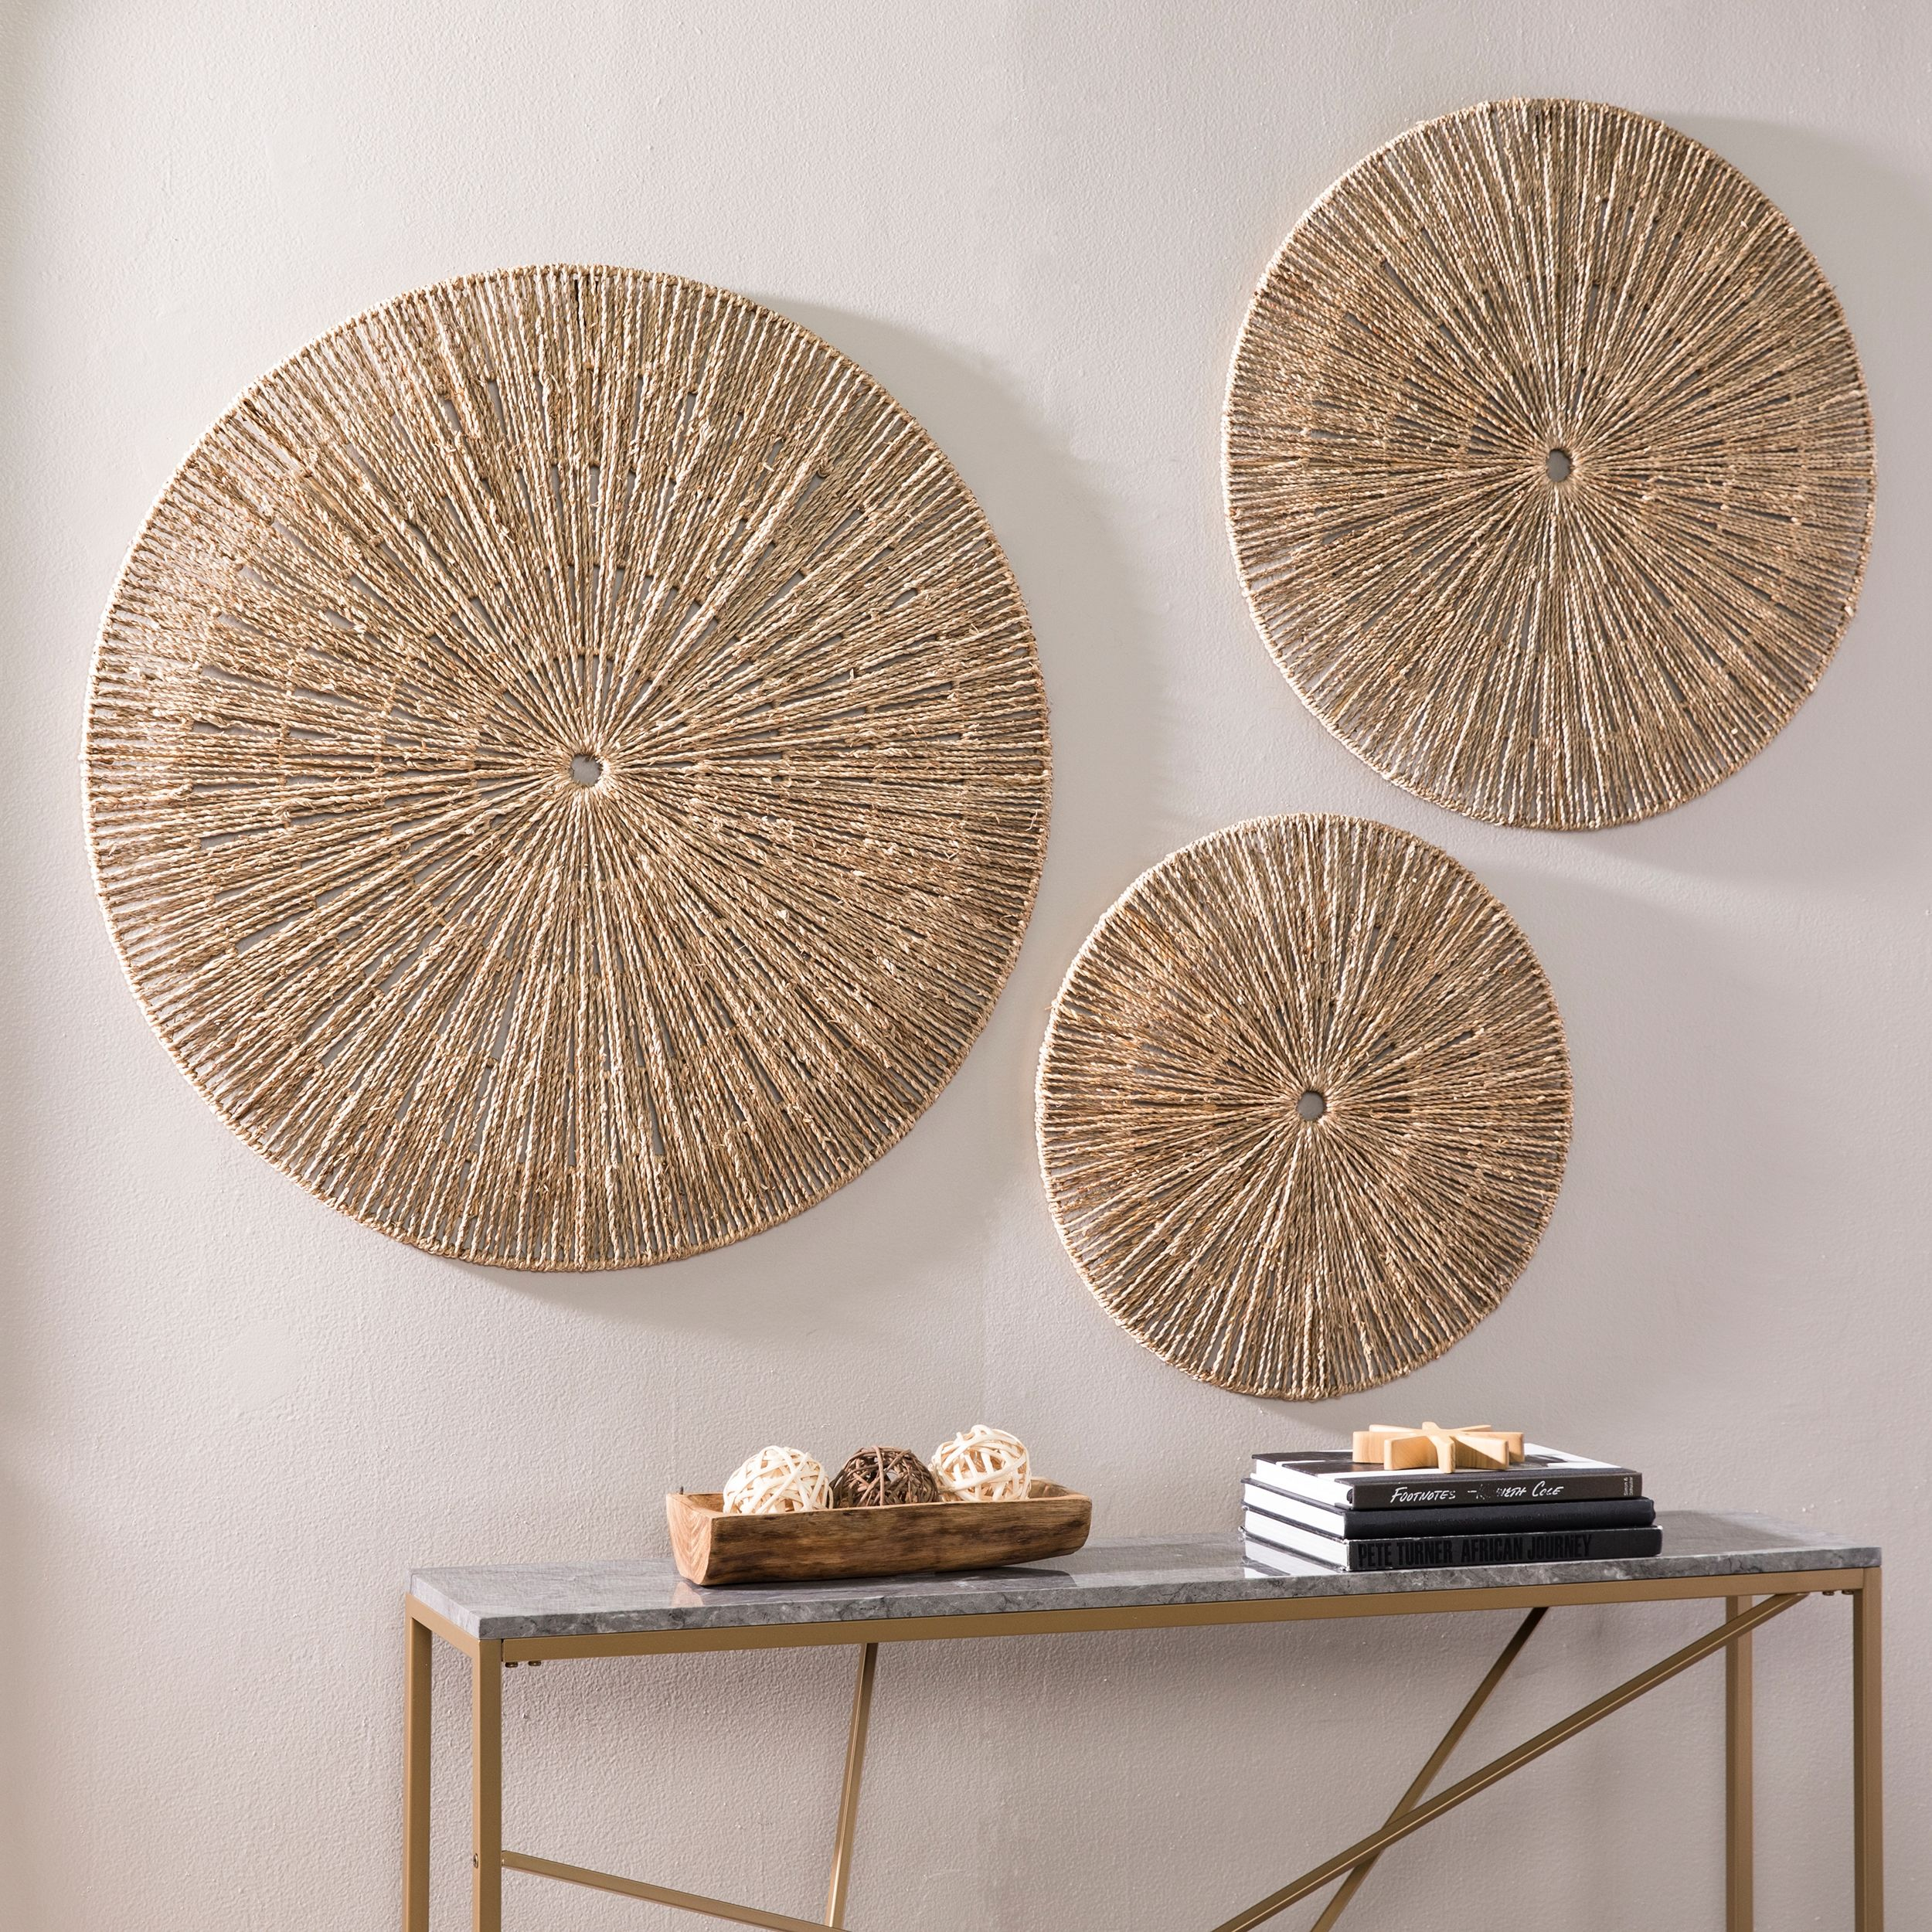 Handwoven Willow Wheel Wall Art 48 Study Decor Oversized Wall Decor Resource Decor